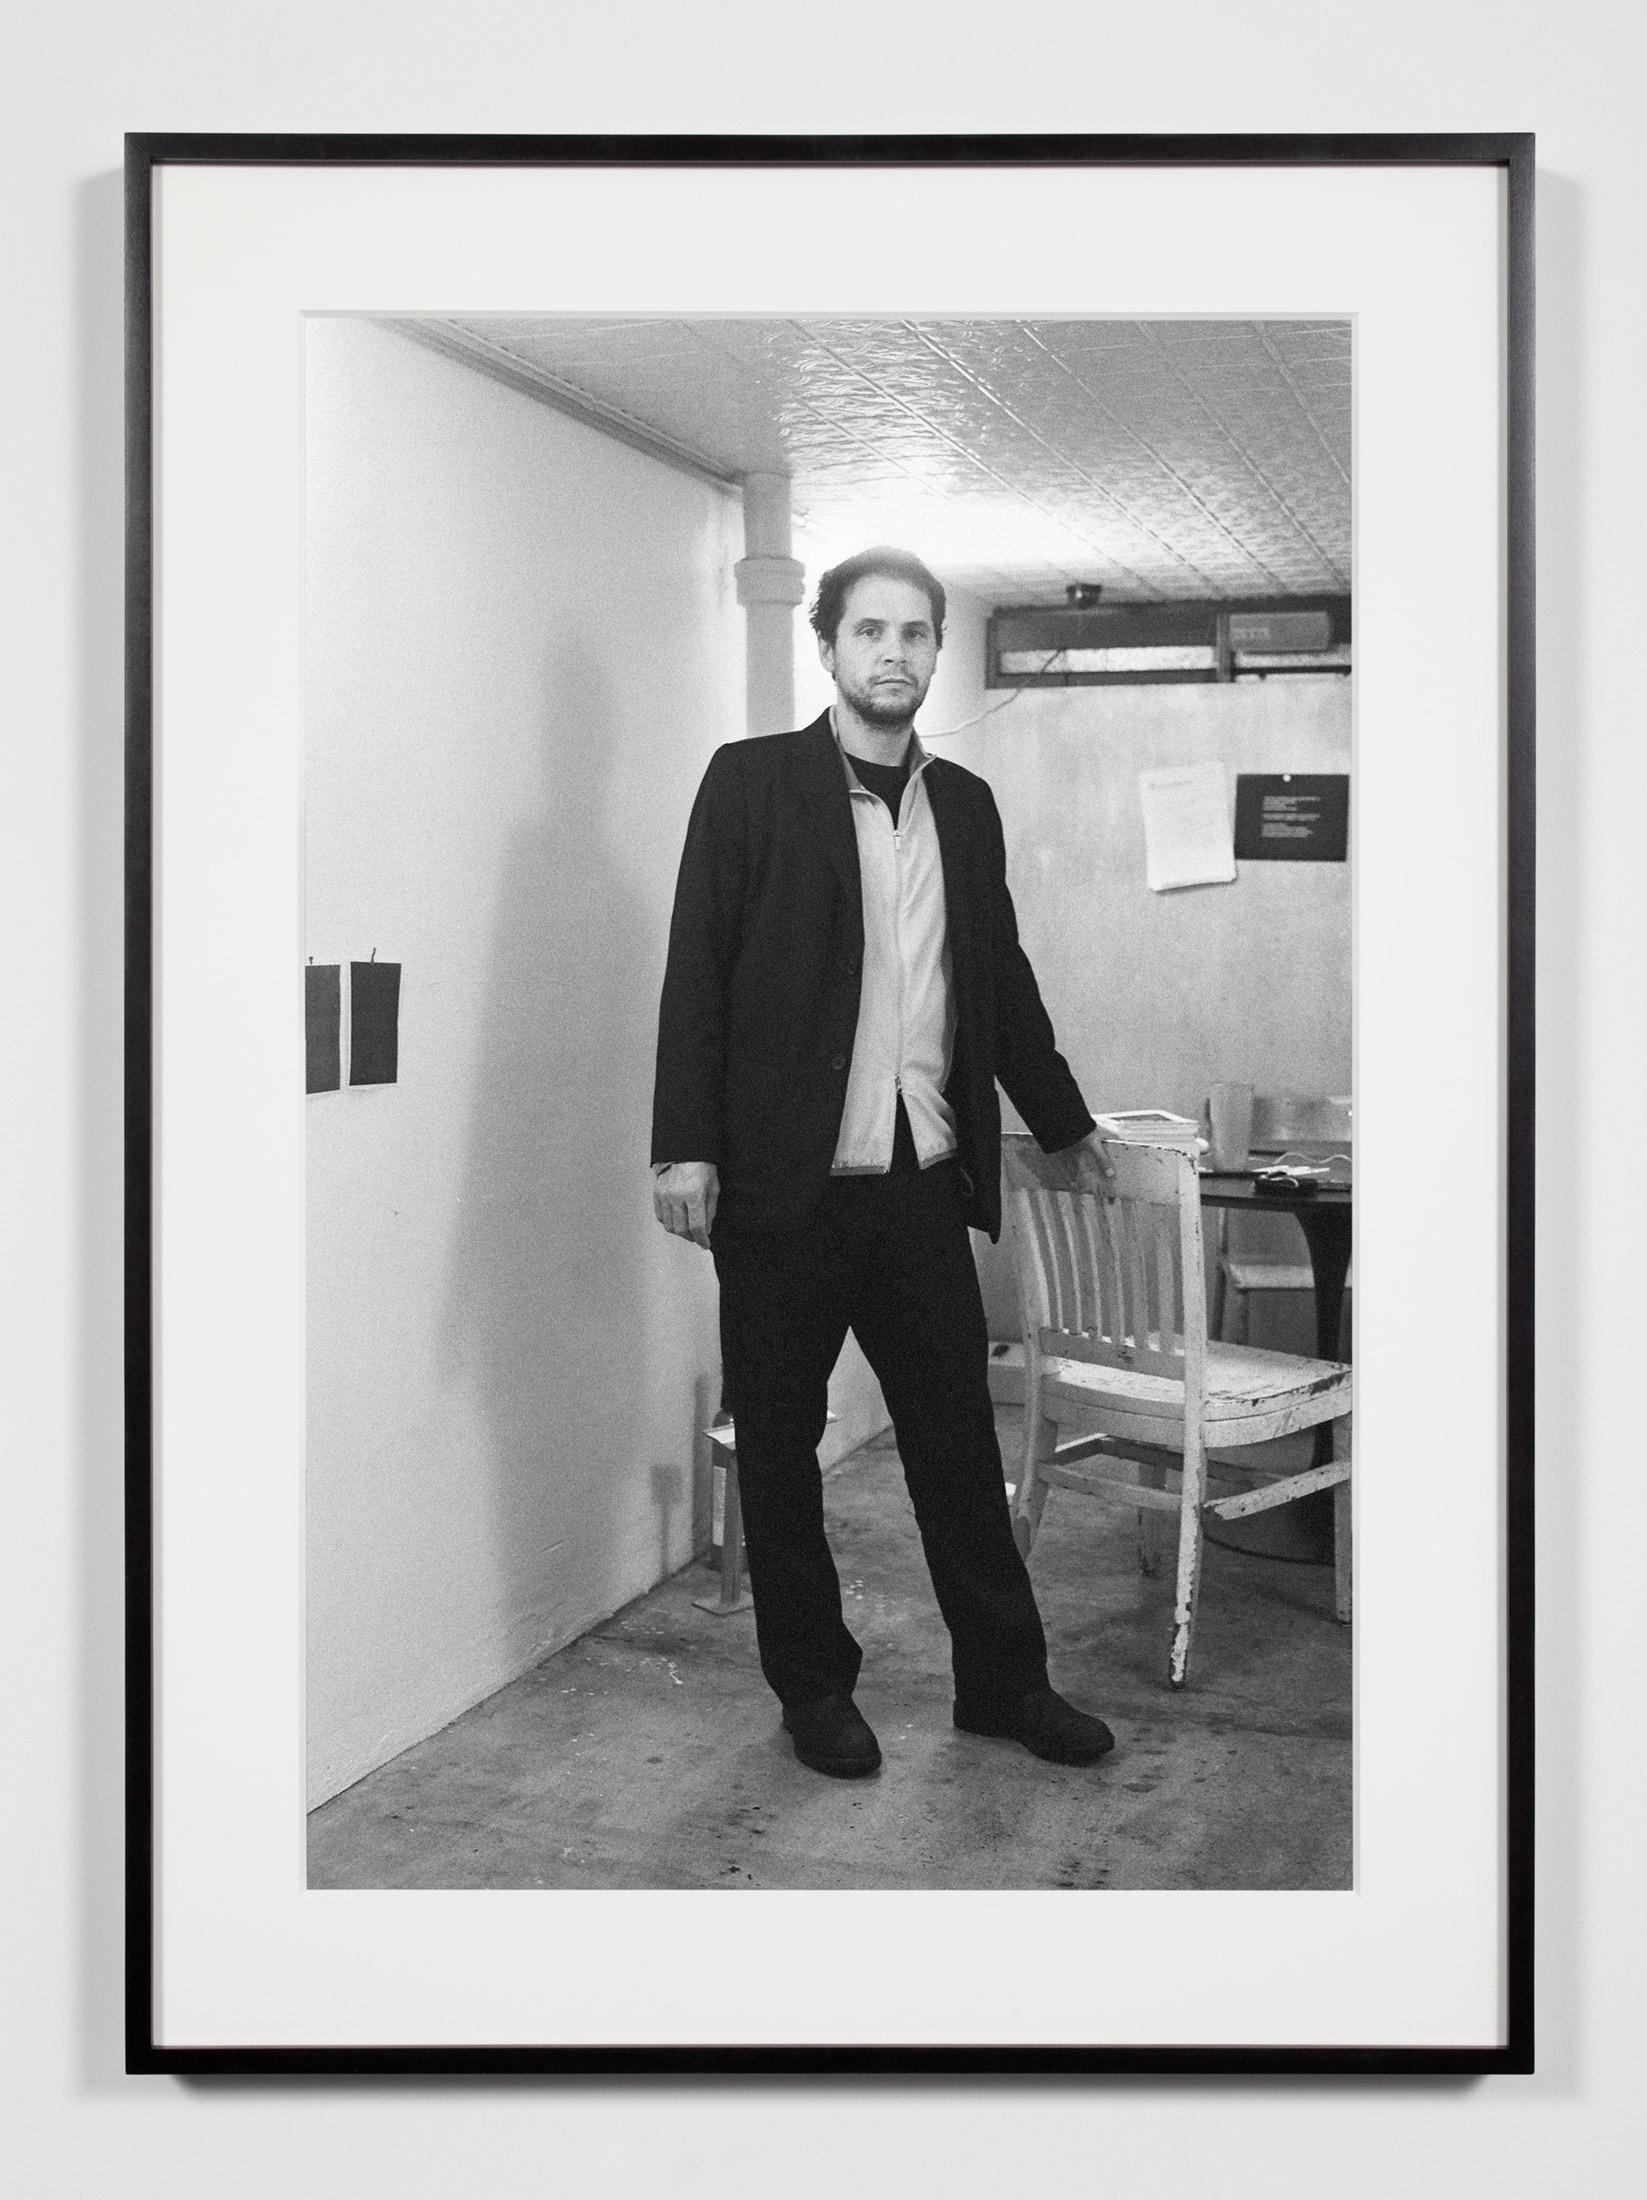 Artist/Designer/Editor/Writer, New York, New York, September 27, 2009    2011   Epson Ultrachrome K3 archival ink jet print on Hahnemühle Photo Rag paper  36 3/8 x 26 3/8 inches   Industrial Portraits, 2008–